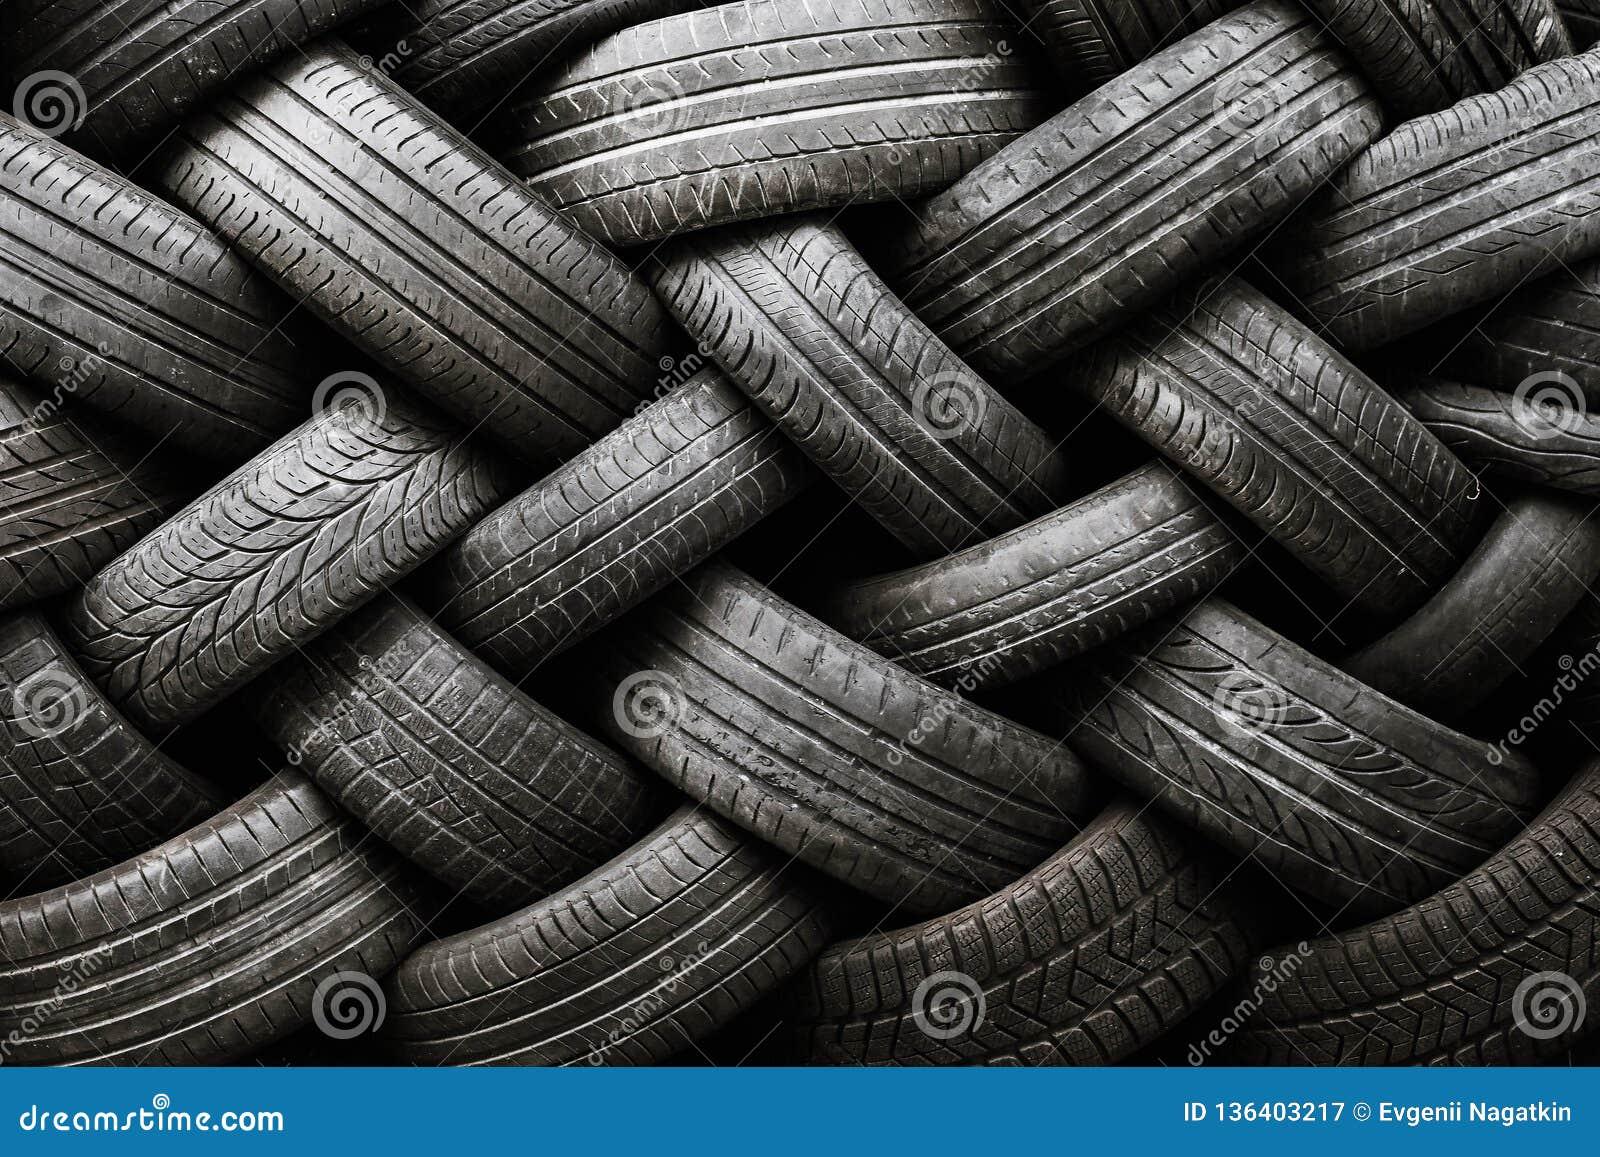 Car tire texture. Car tires on a dark background